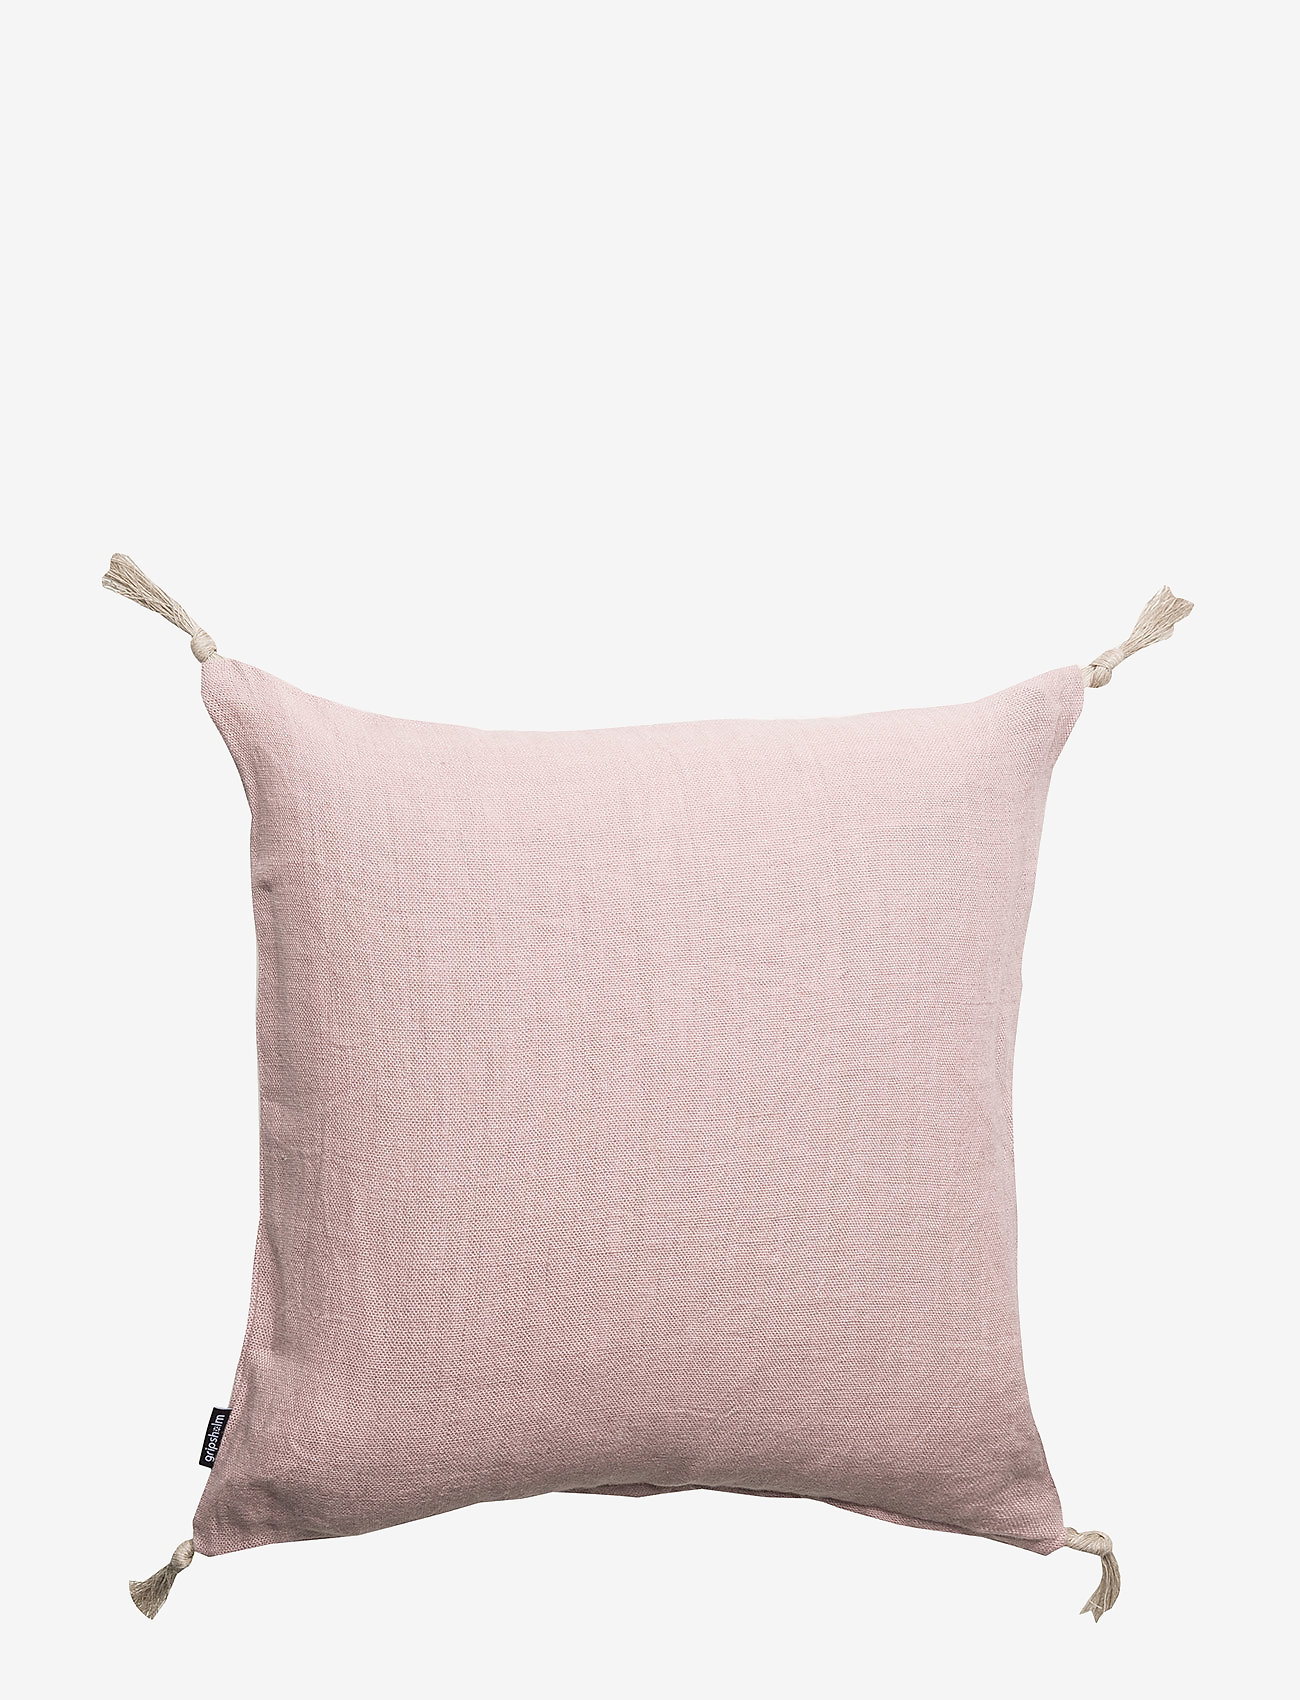 Gripsholm - CUSHION COVER - kussenovertrekken - pink lilac - 1